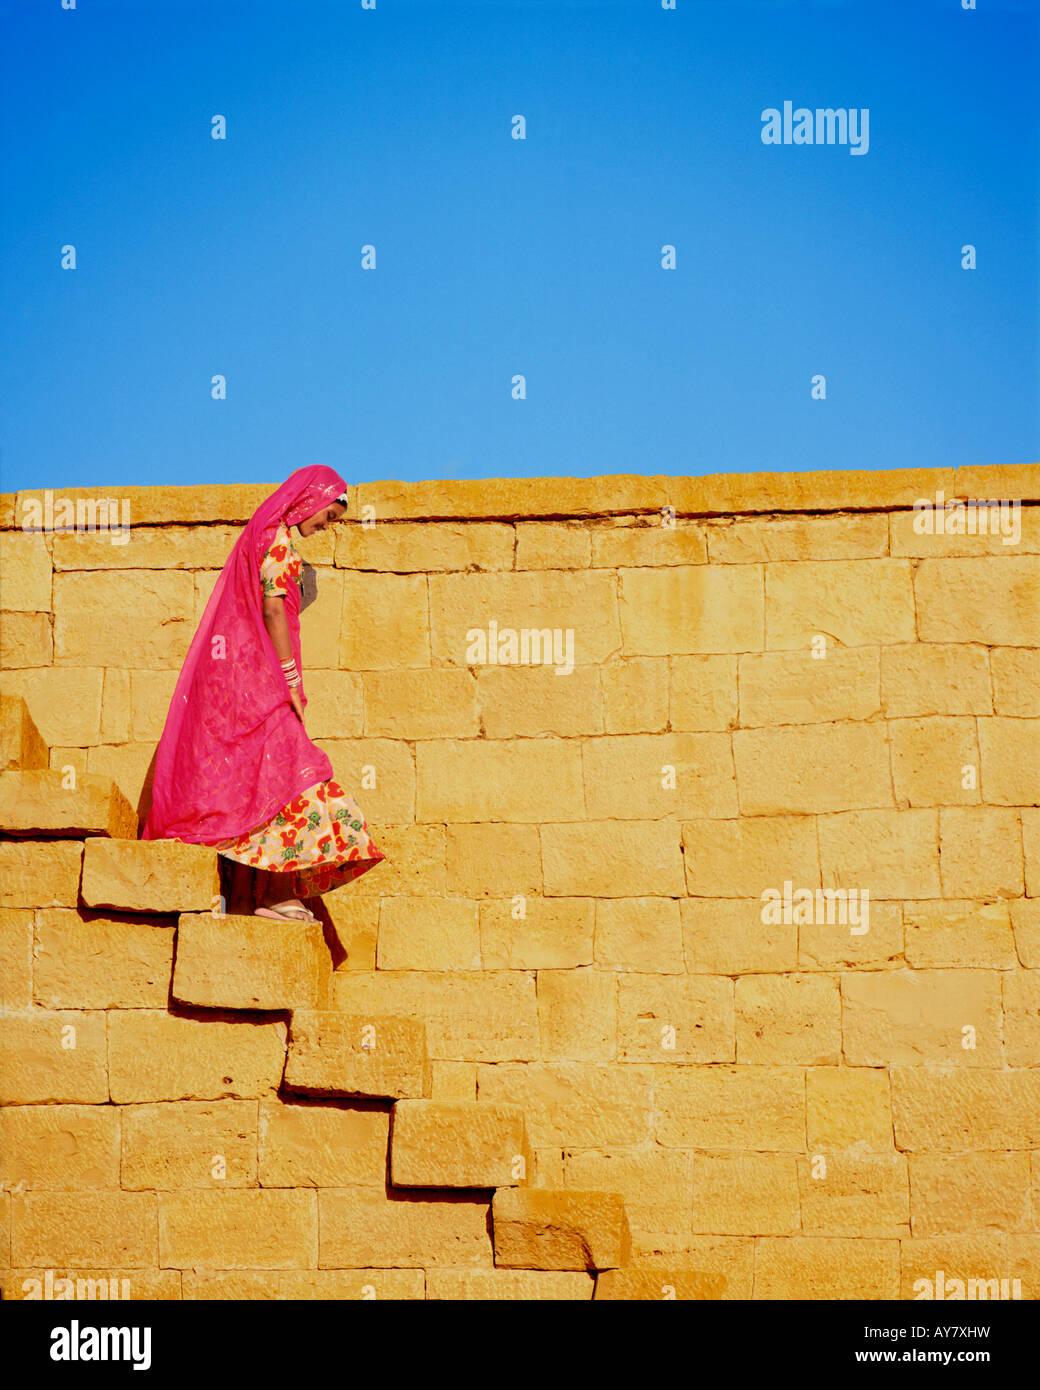 Indian woman, Jaiselmer, Rajasthan, India - Stock Image